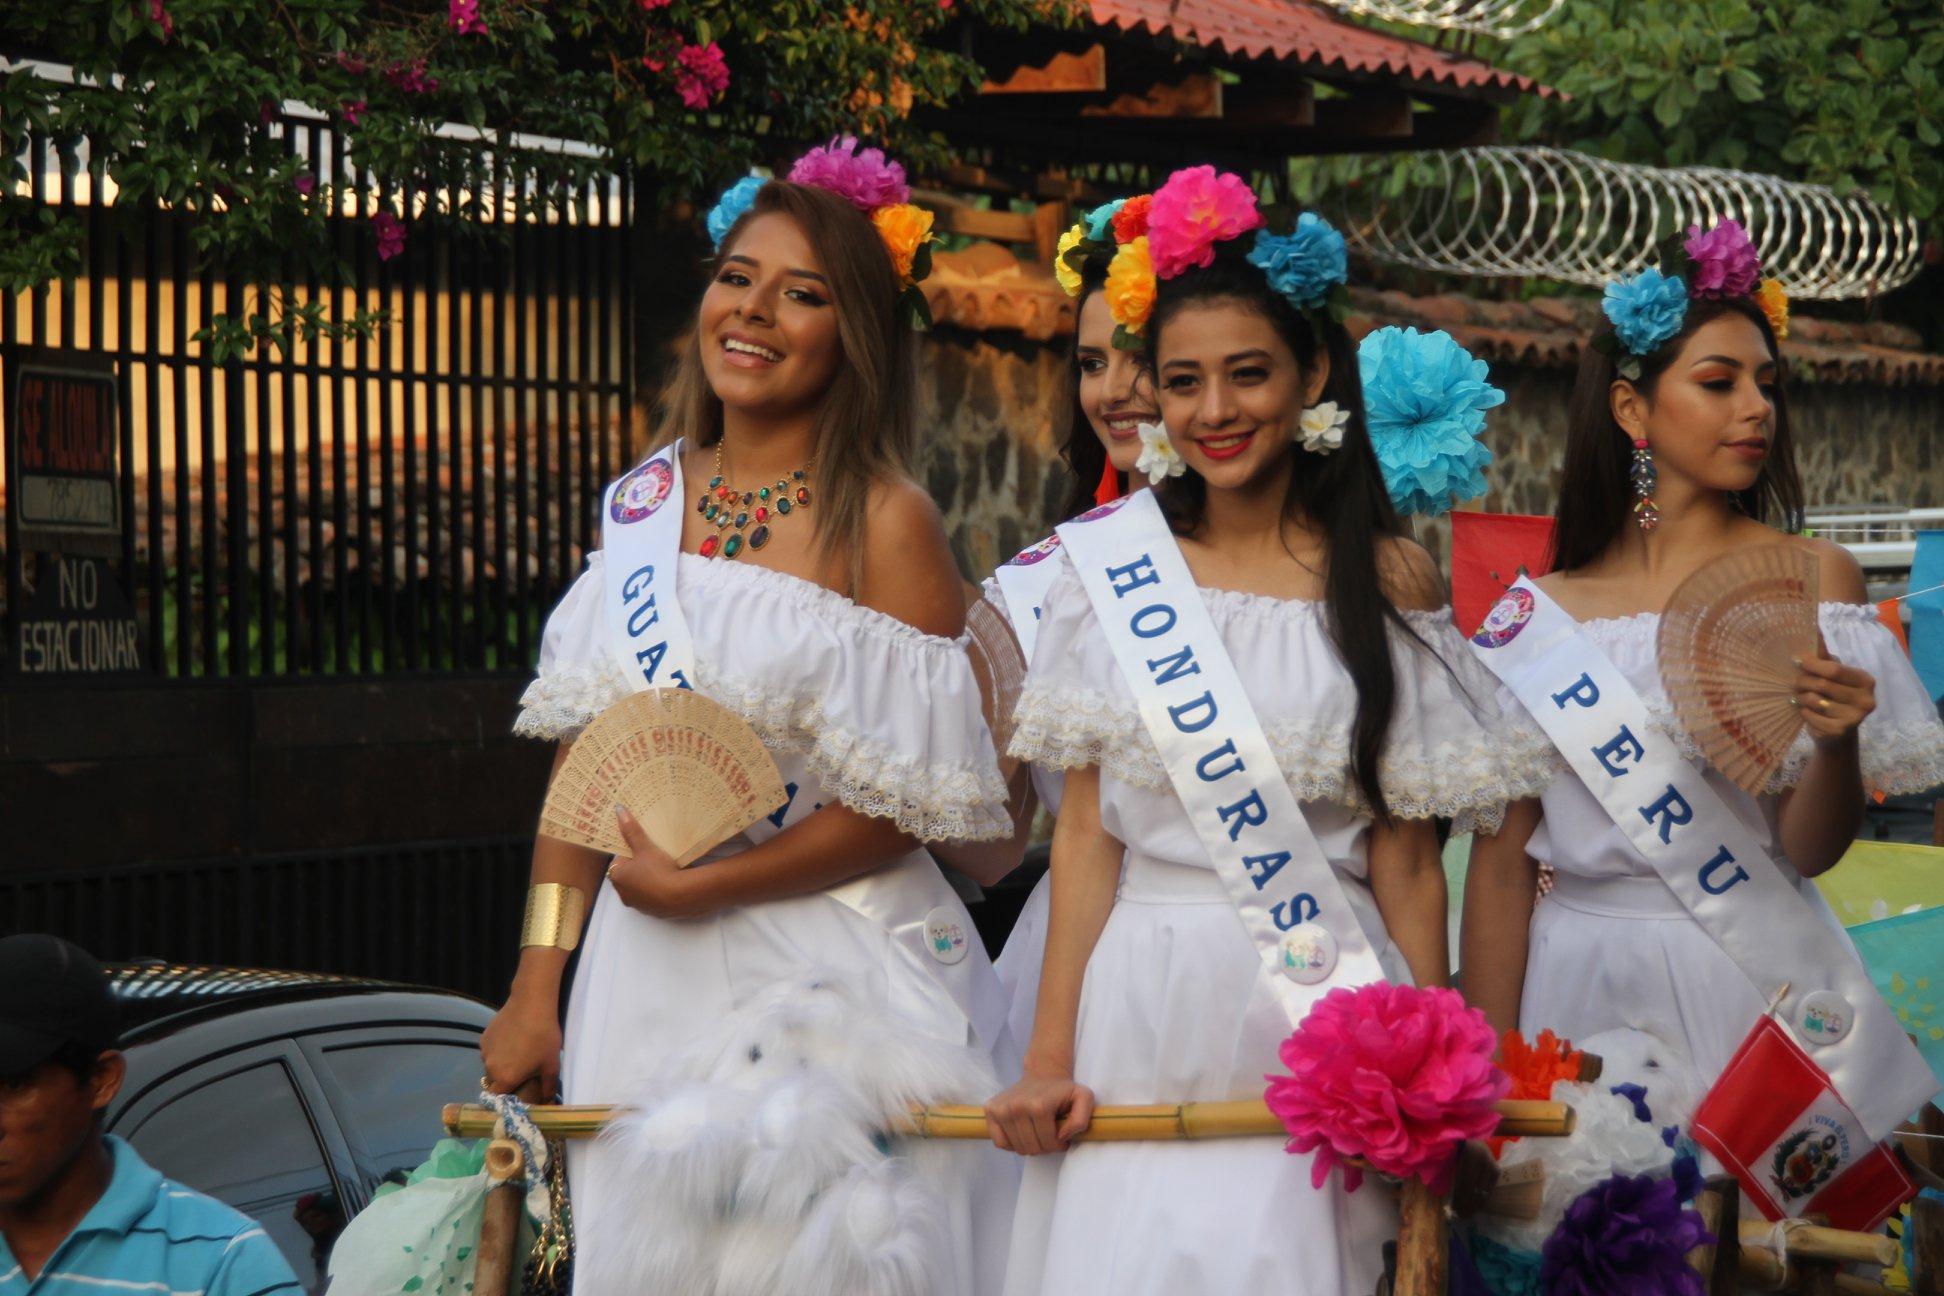 romina lopez, top 12 de miss teen mundial 2019. - Página 2 60713910